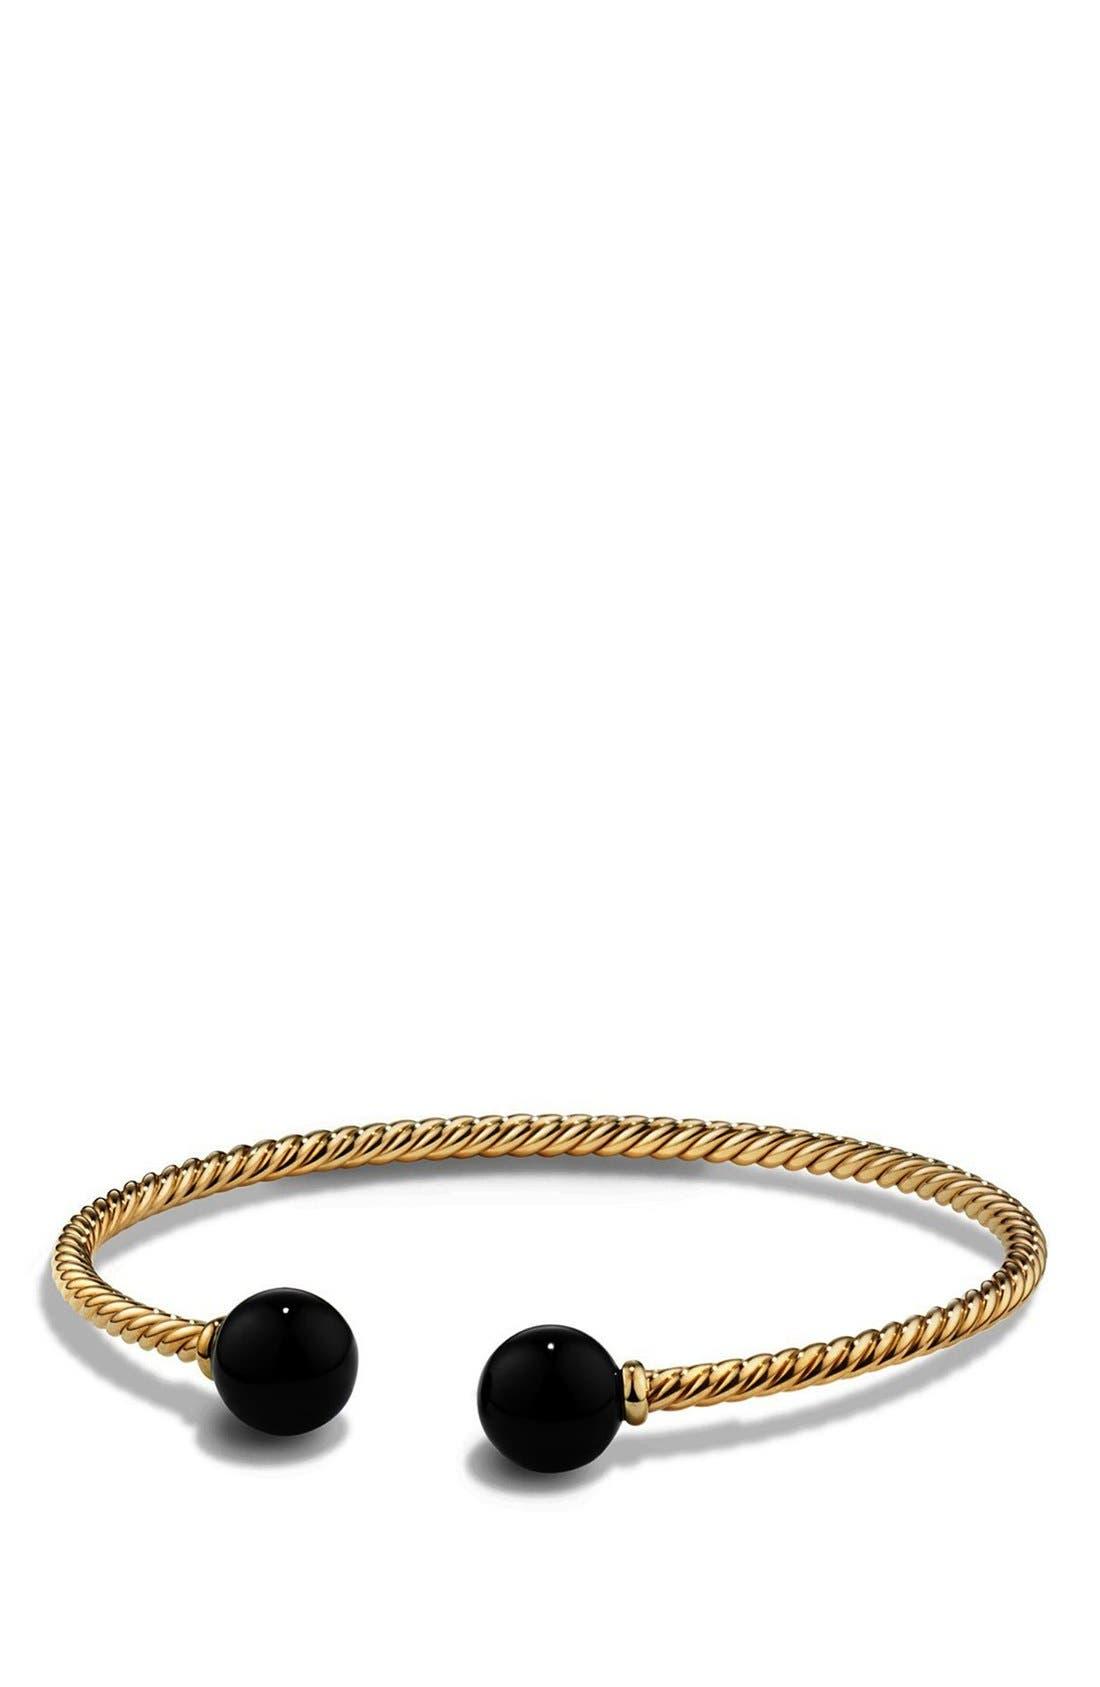 Alternate Image 1 Selected - David Yurman 'Solari' Bead Bracelet